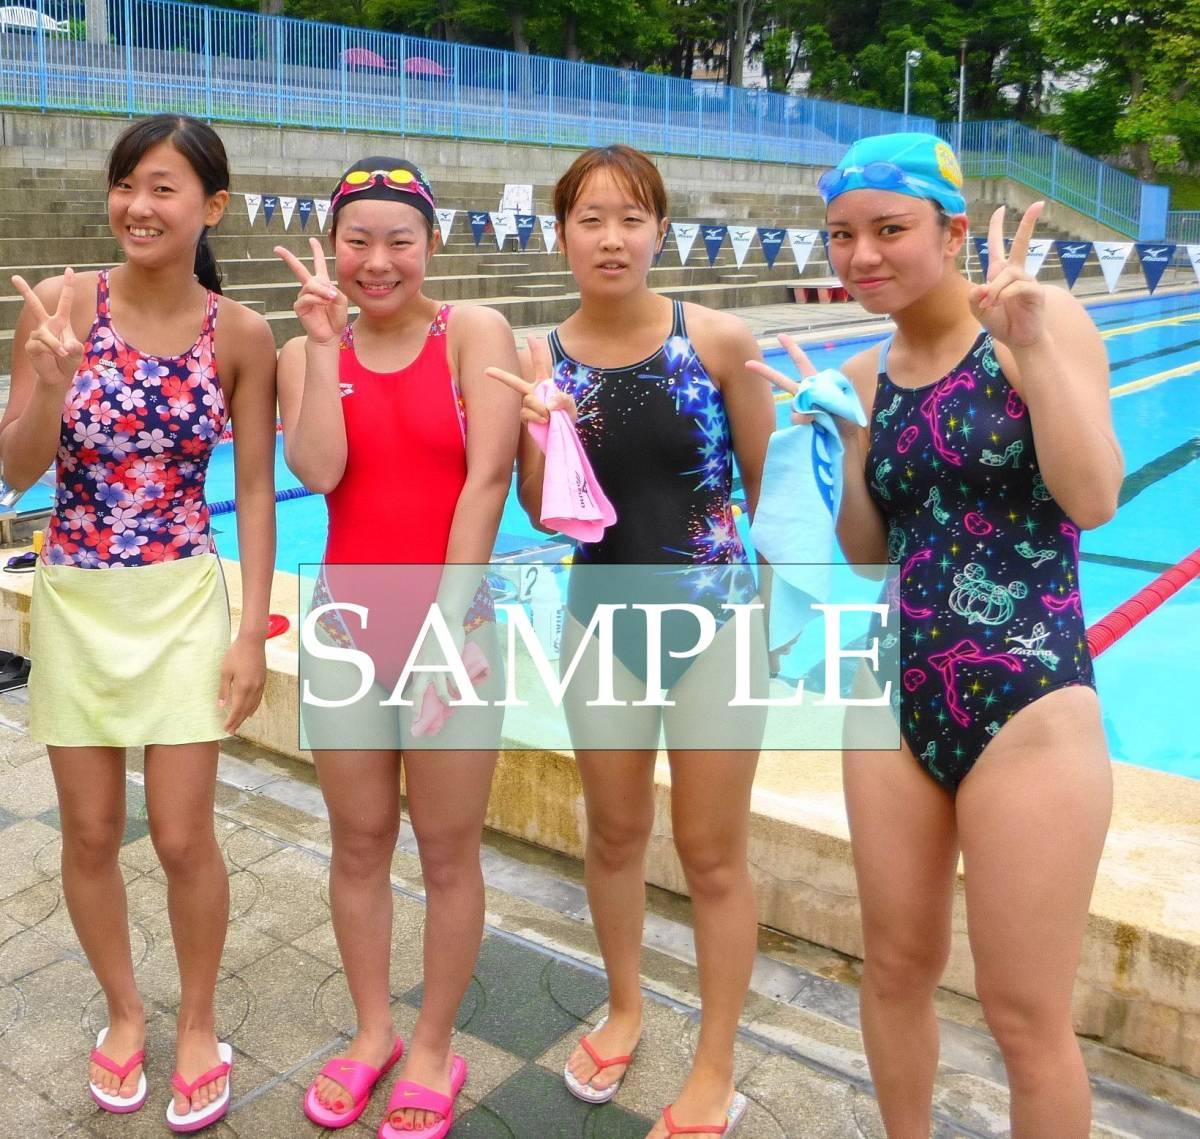 S35 生写真 水泳 水着 スク水 競泳水着 女子 L判 L版 女子アスリート 高画質 グラビア スポーツ_画像1